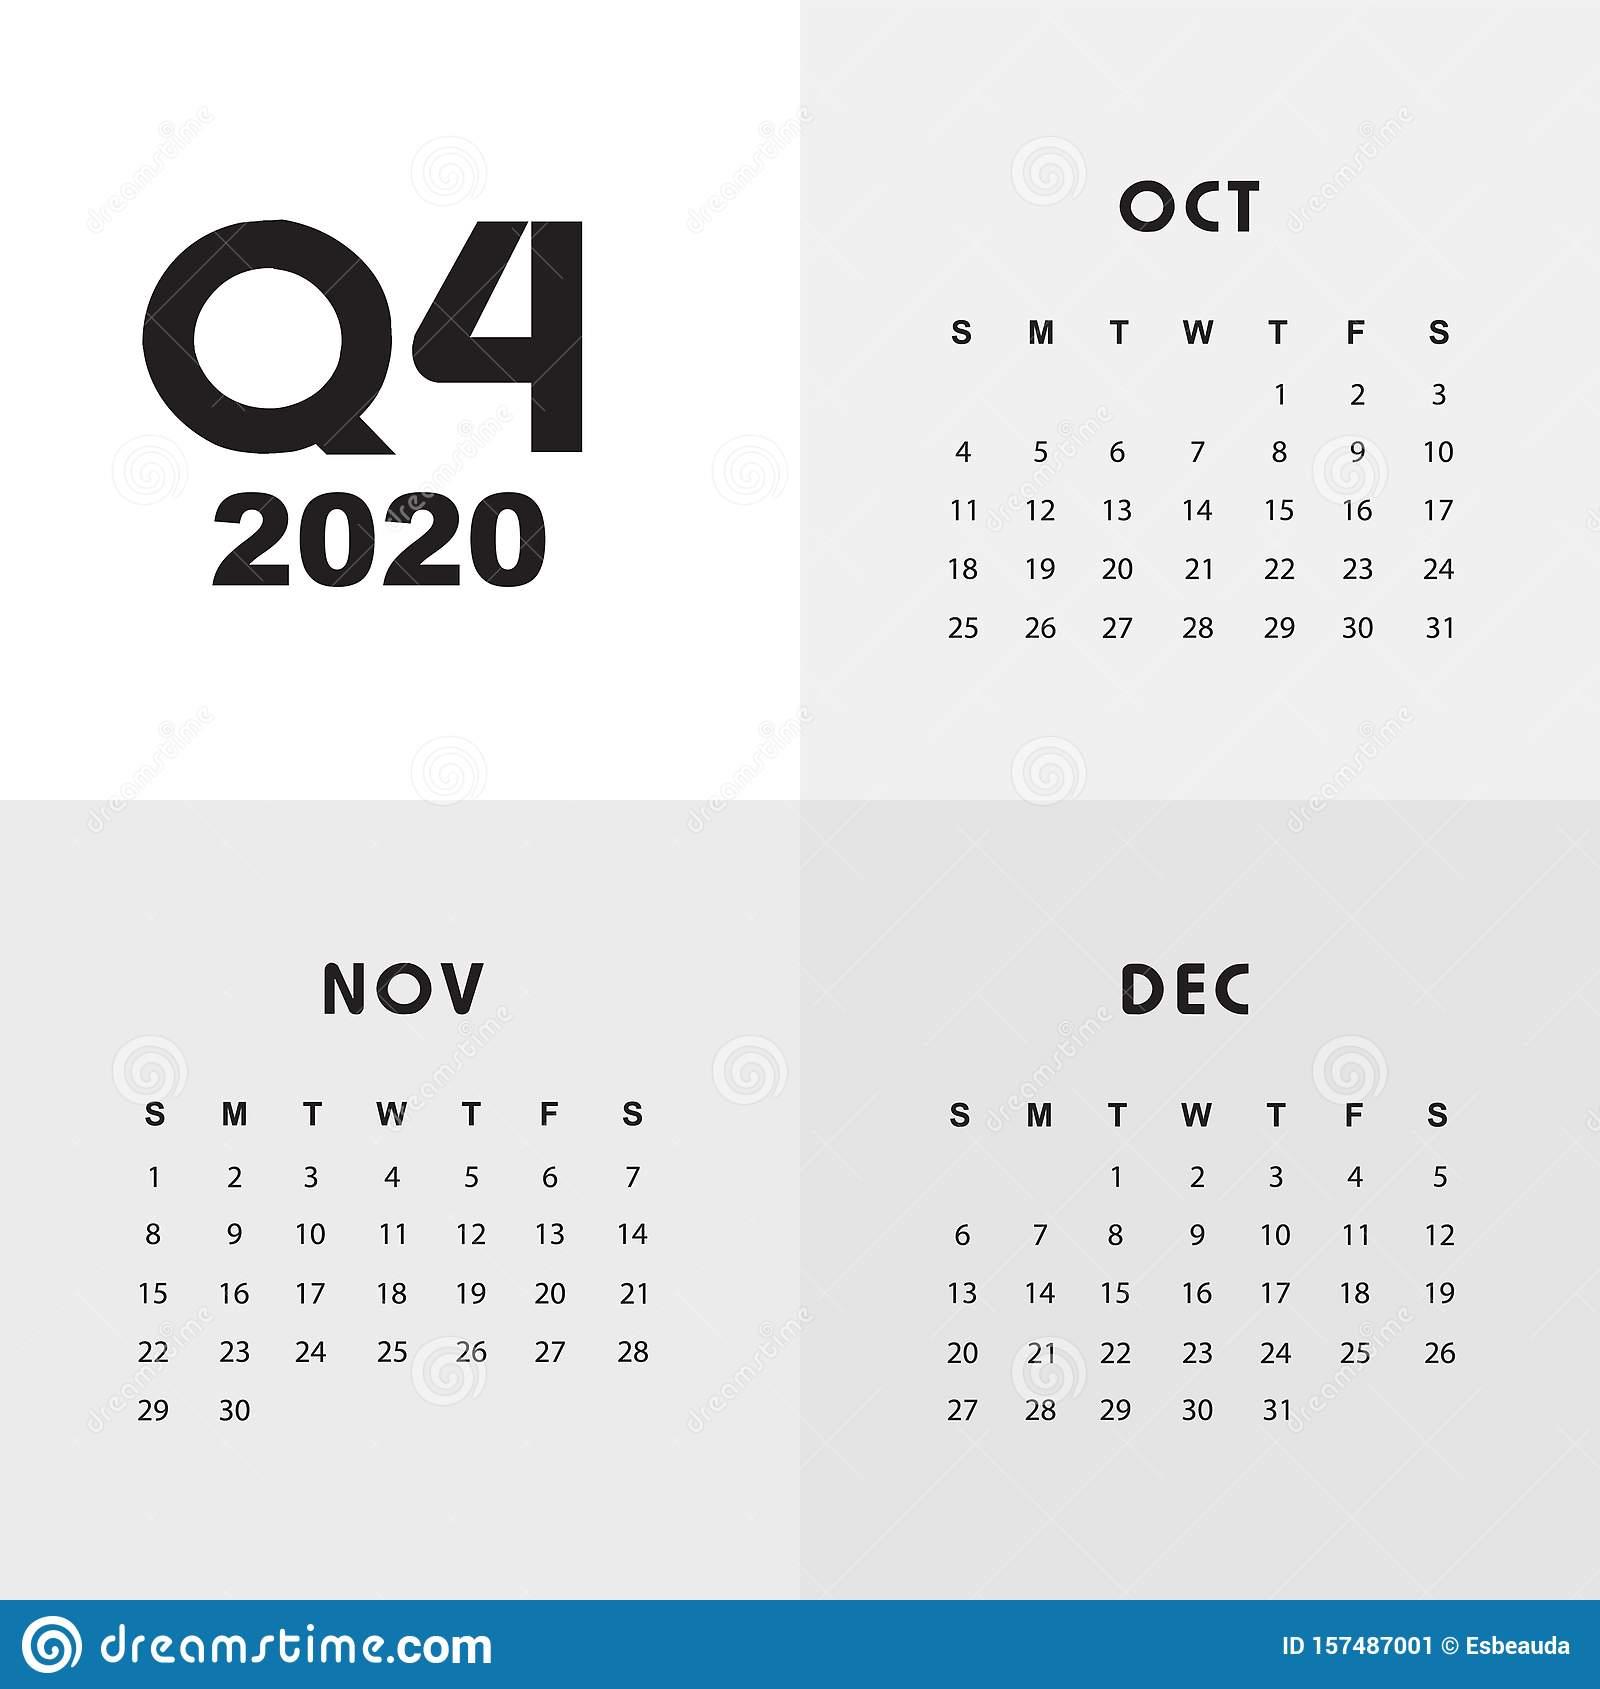 Fourth Quarter Of Calendar 2020 Stock Vector - Illustration